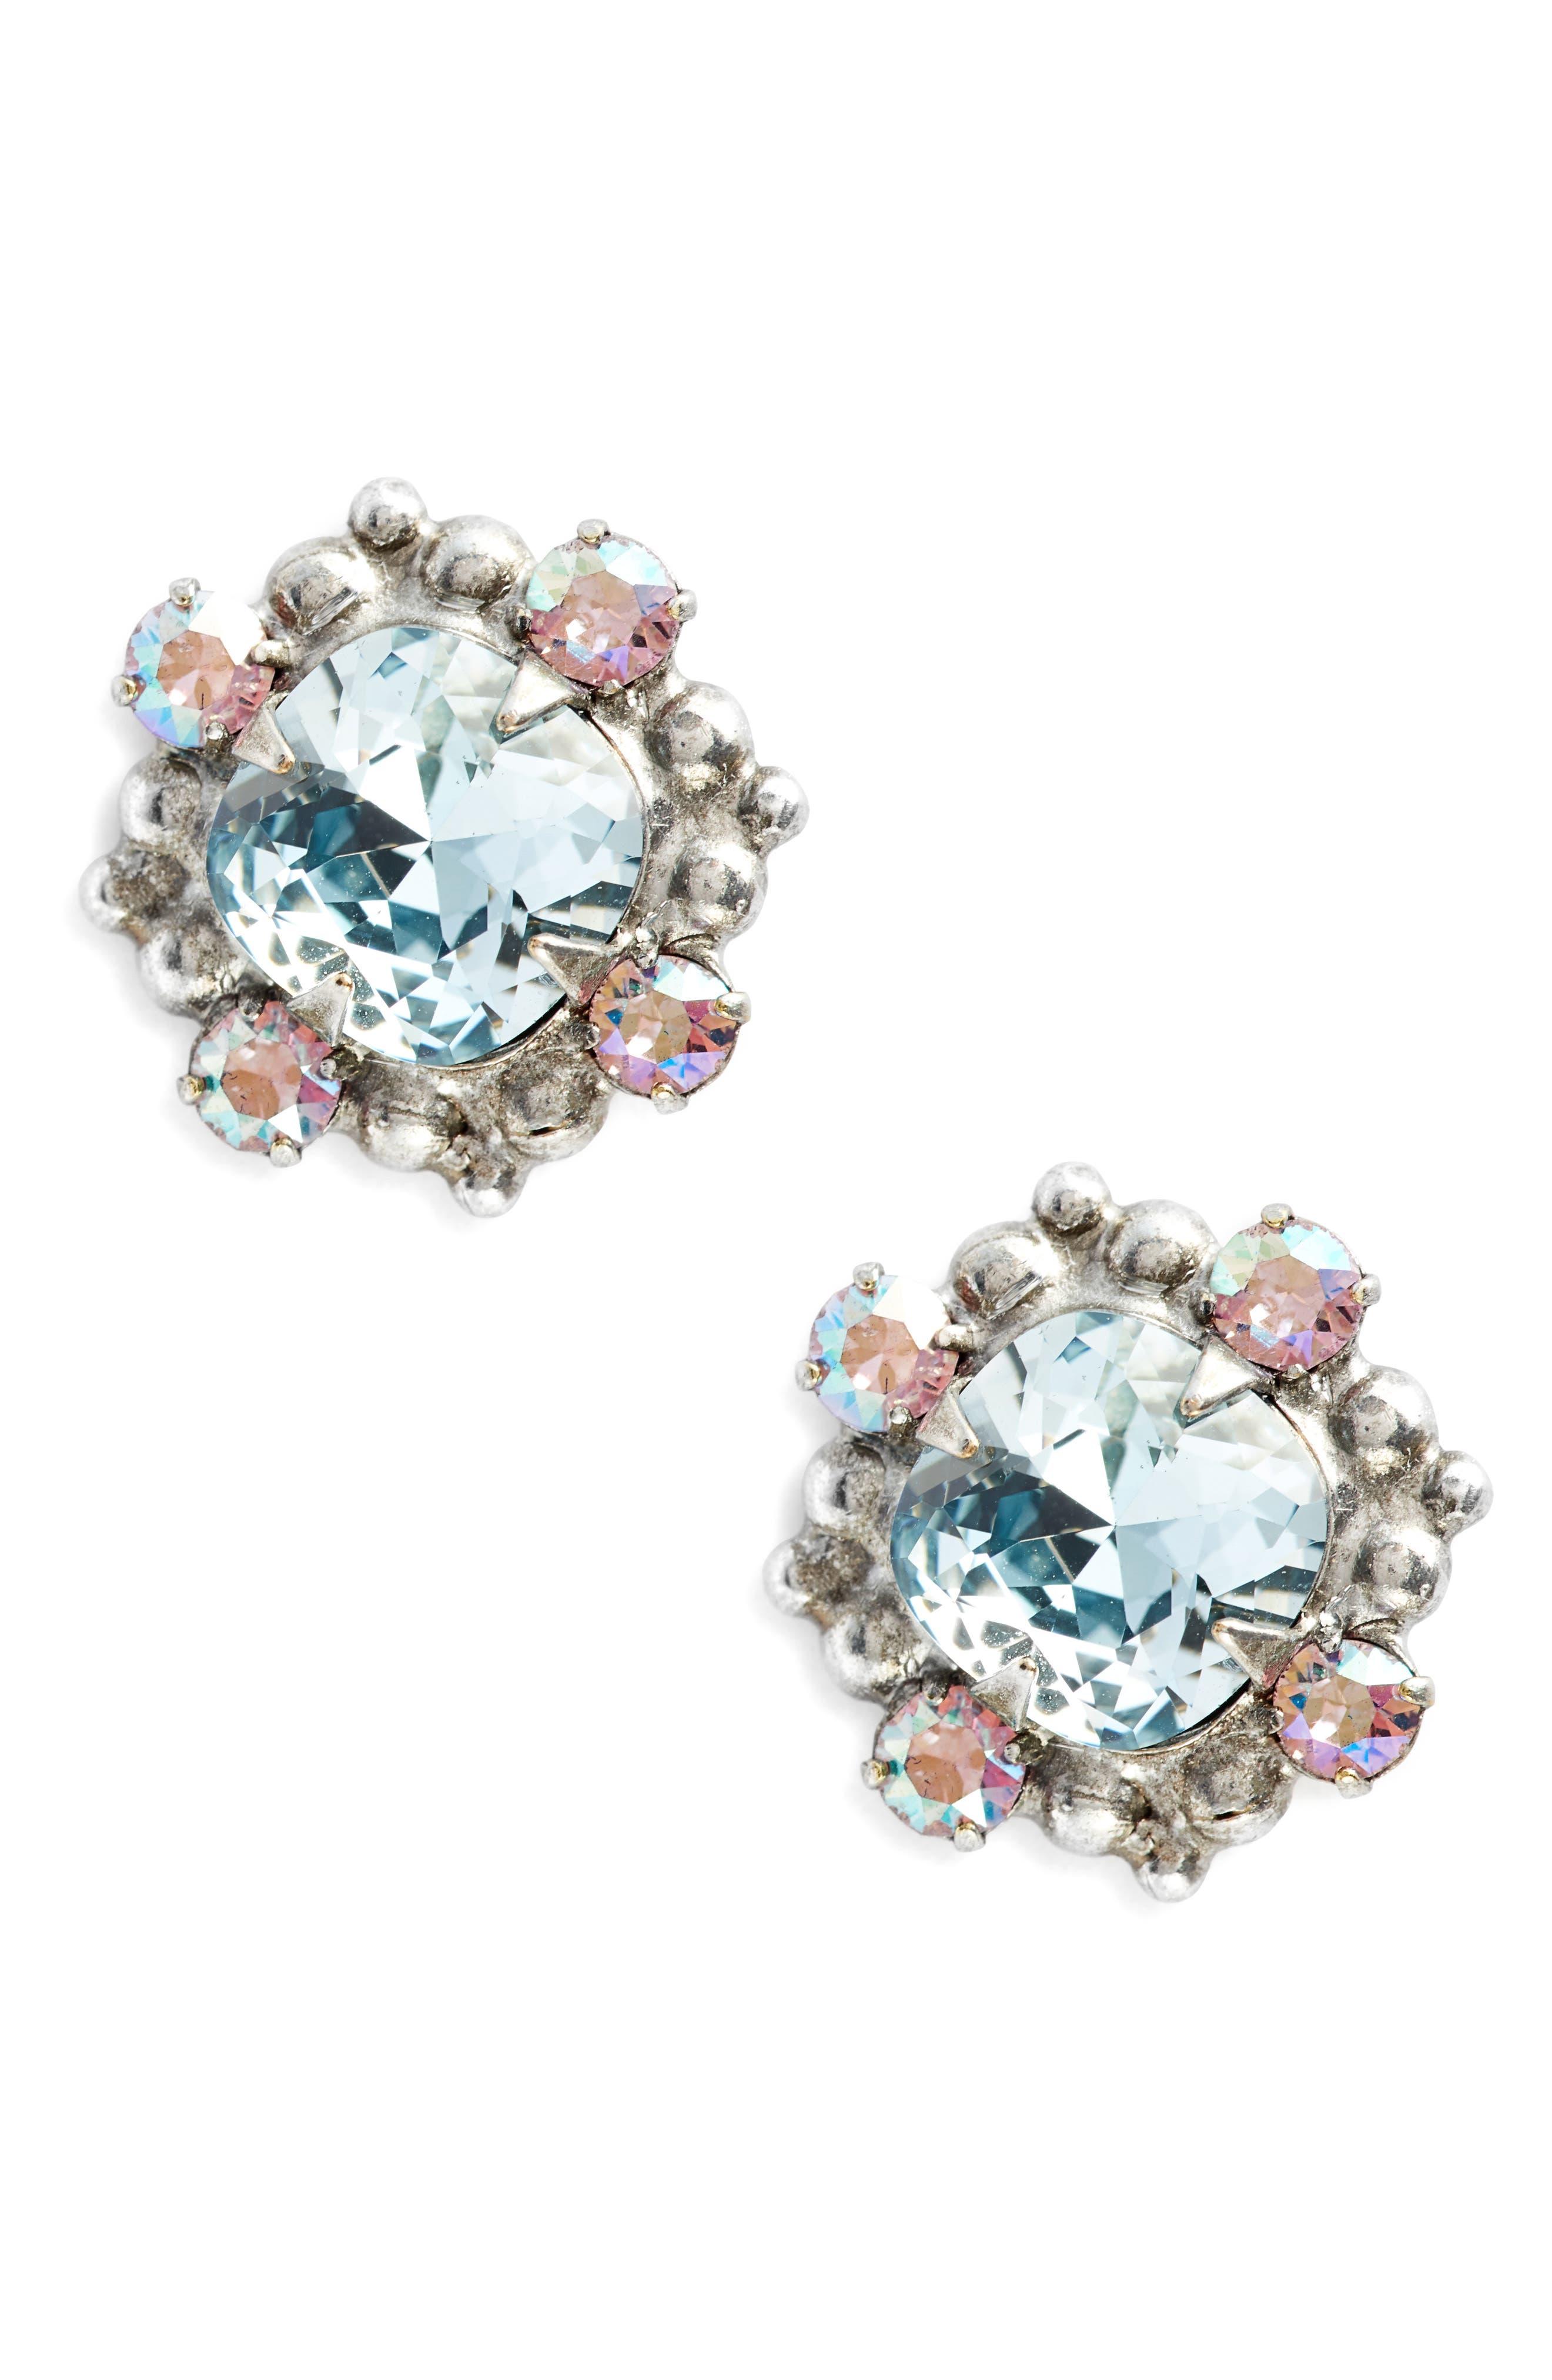 Hibiscus Crystal Earrings,                             Main thumbnail 1, color,                             BLUE